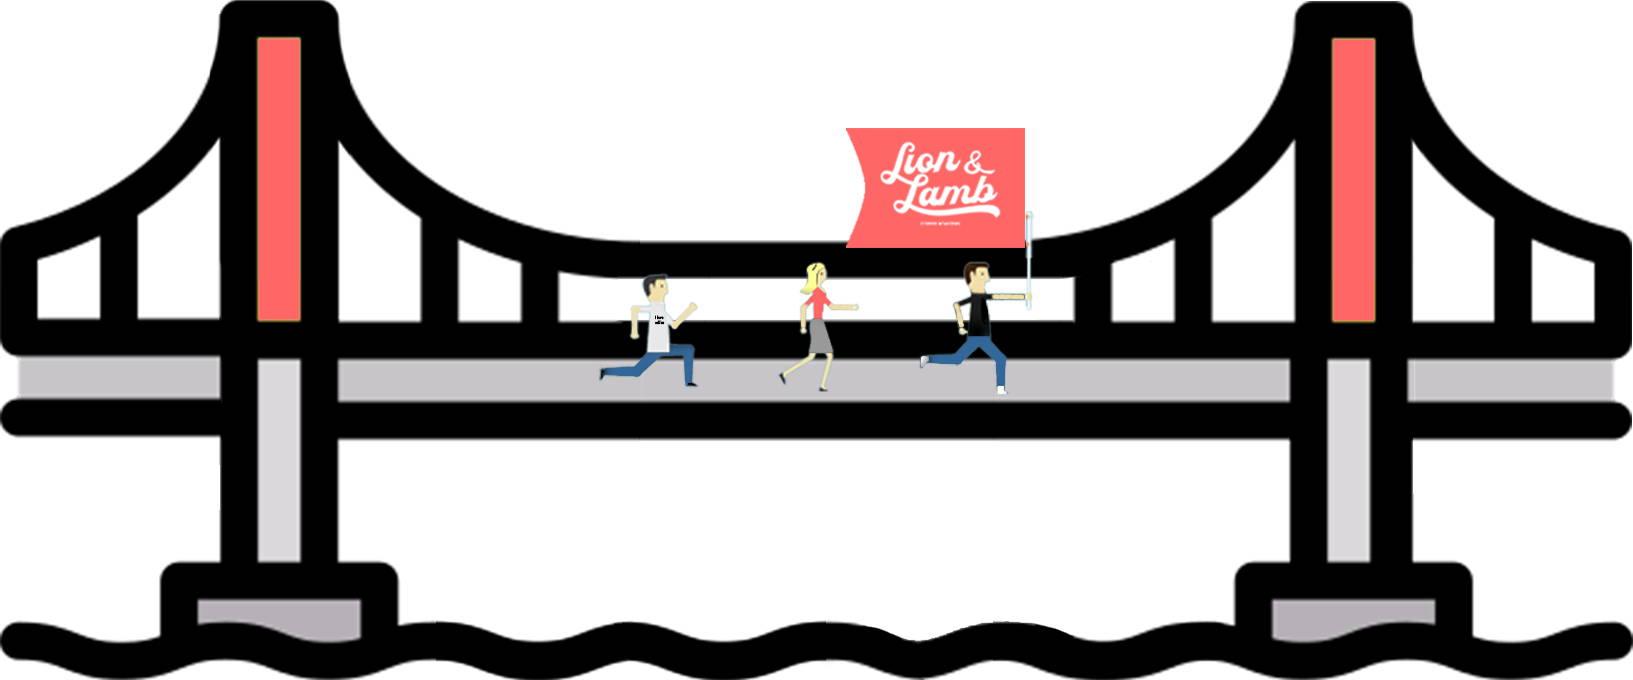 Cartoon artwork of people running across a bridge